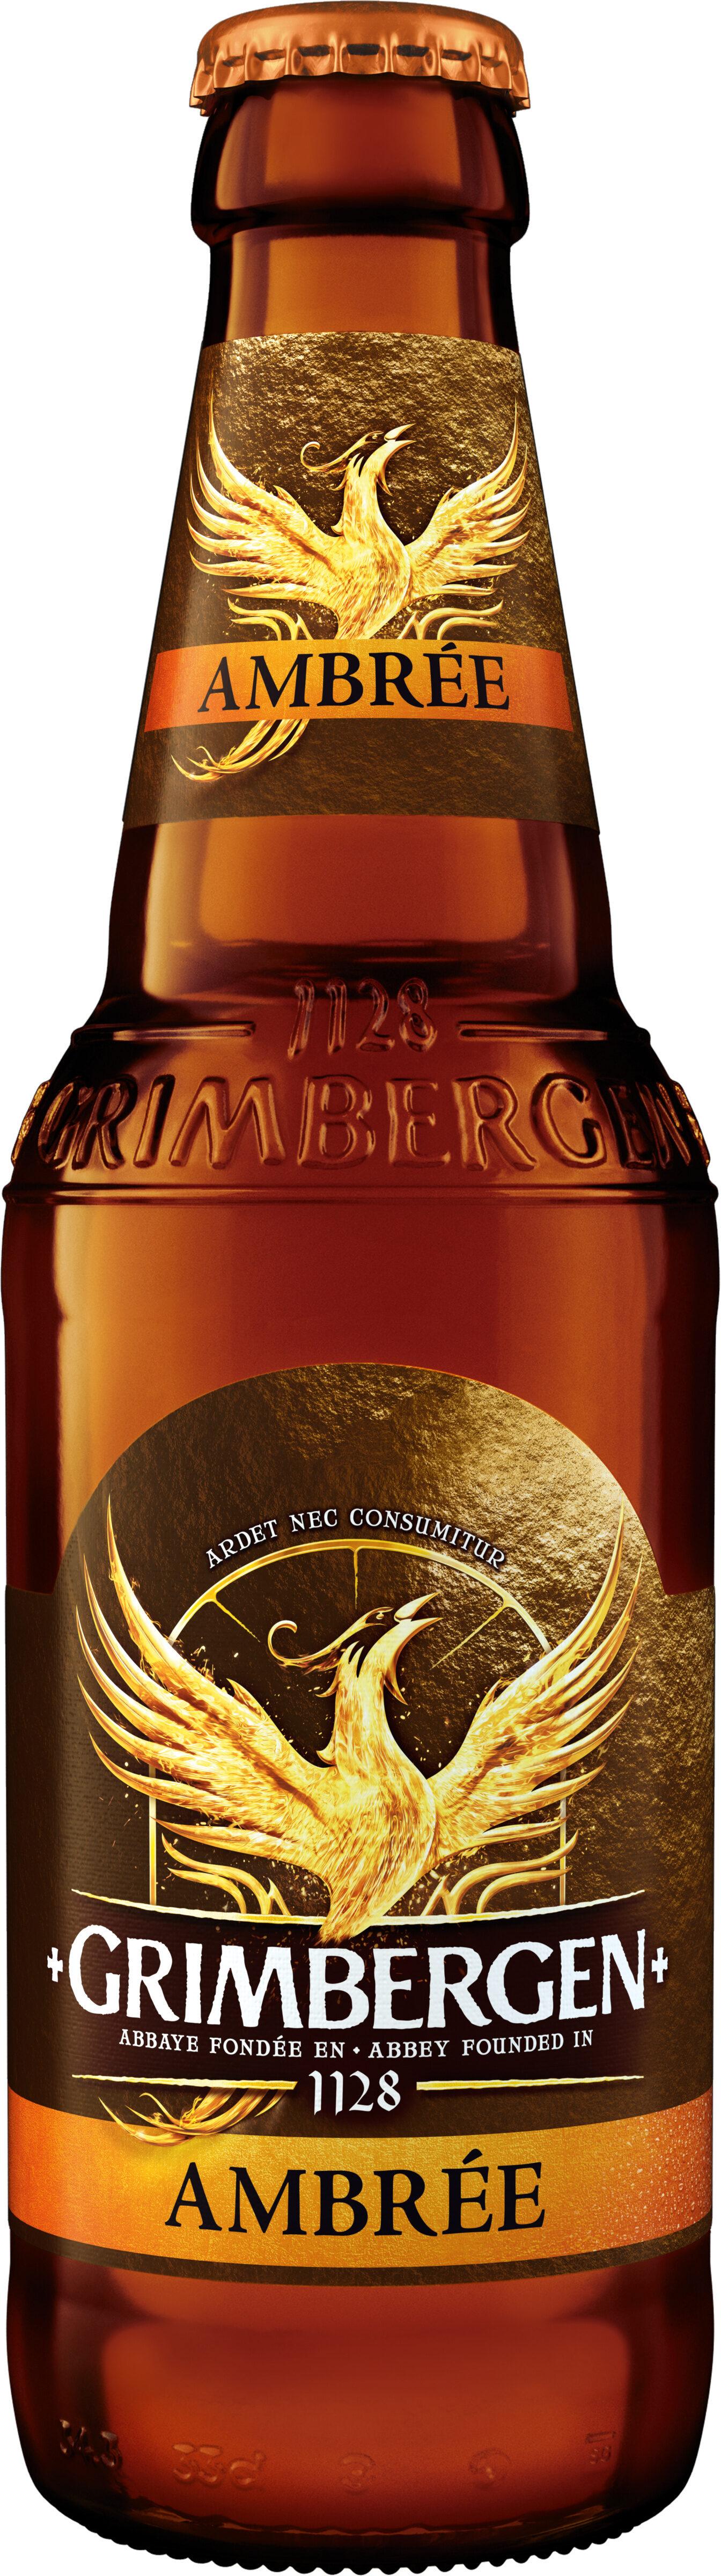 Grimbergen - 33cl grimbergen ambree - 6.50 degre alcool - Producte - fr